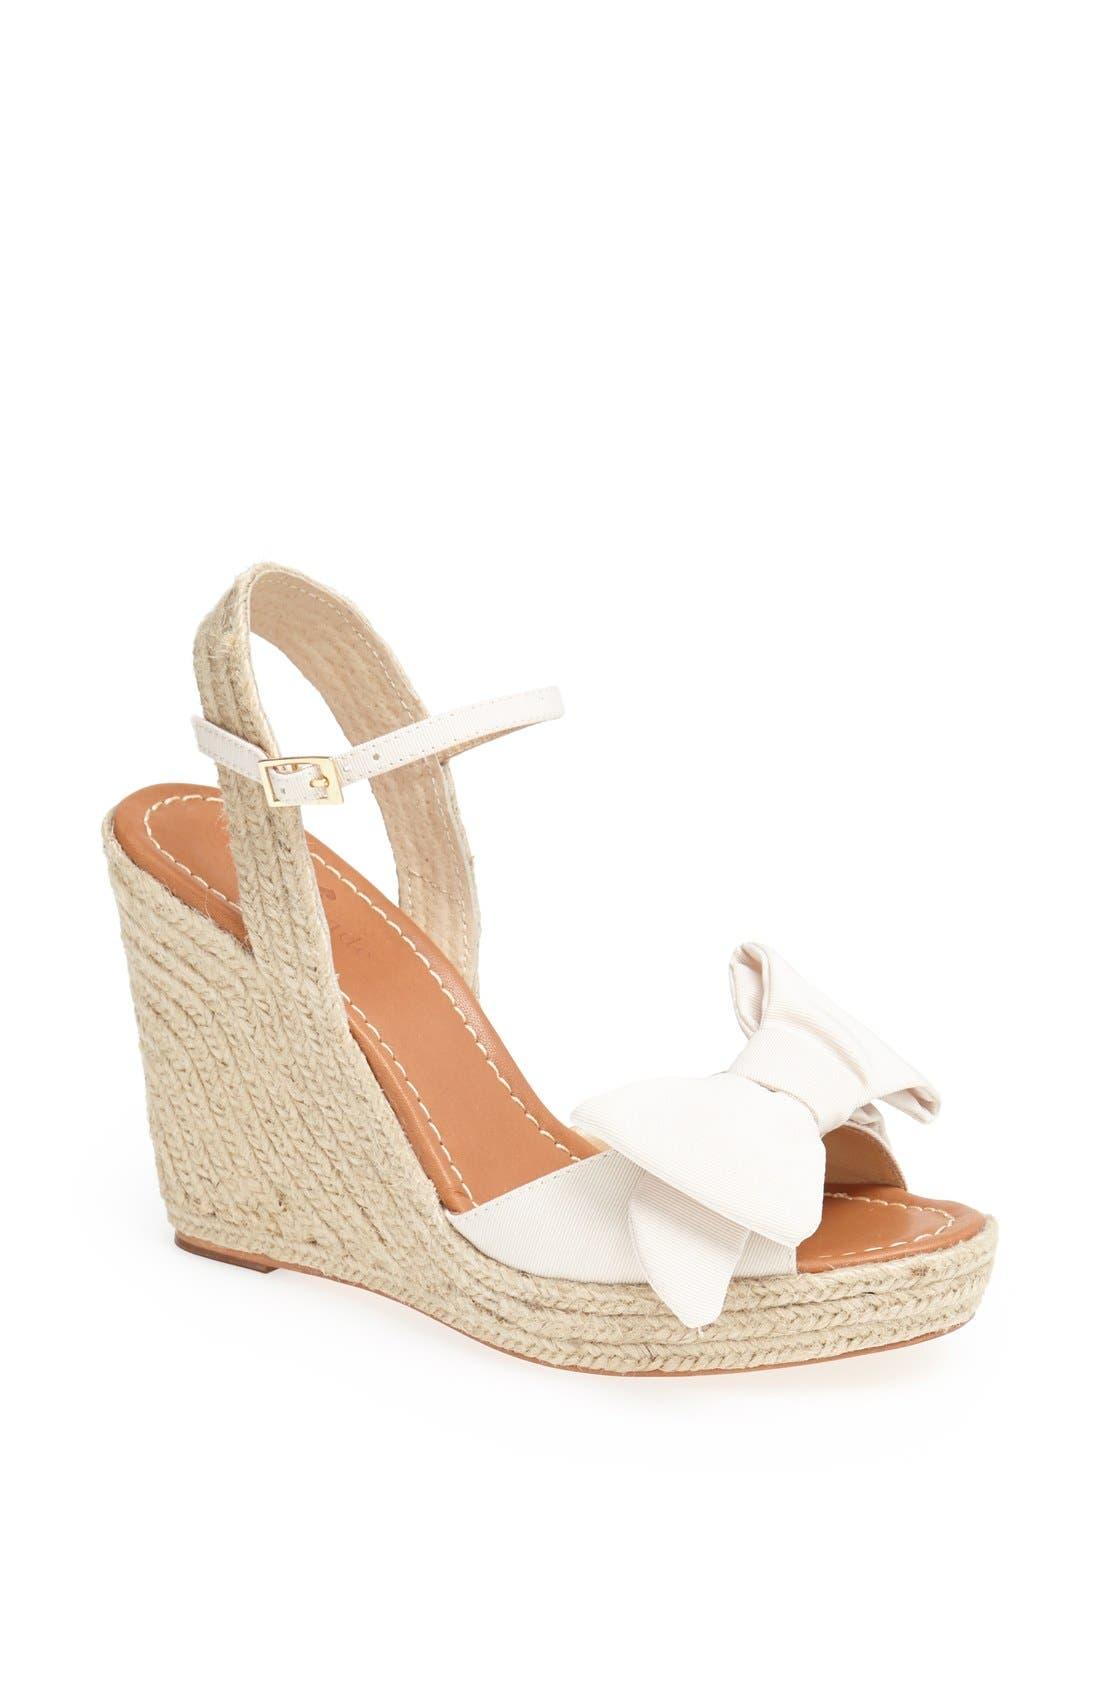 Main Image - kate spade new york 'jumper' sandal